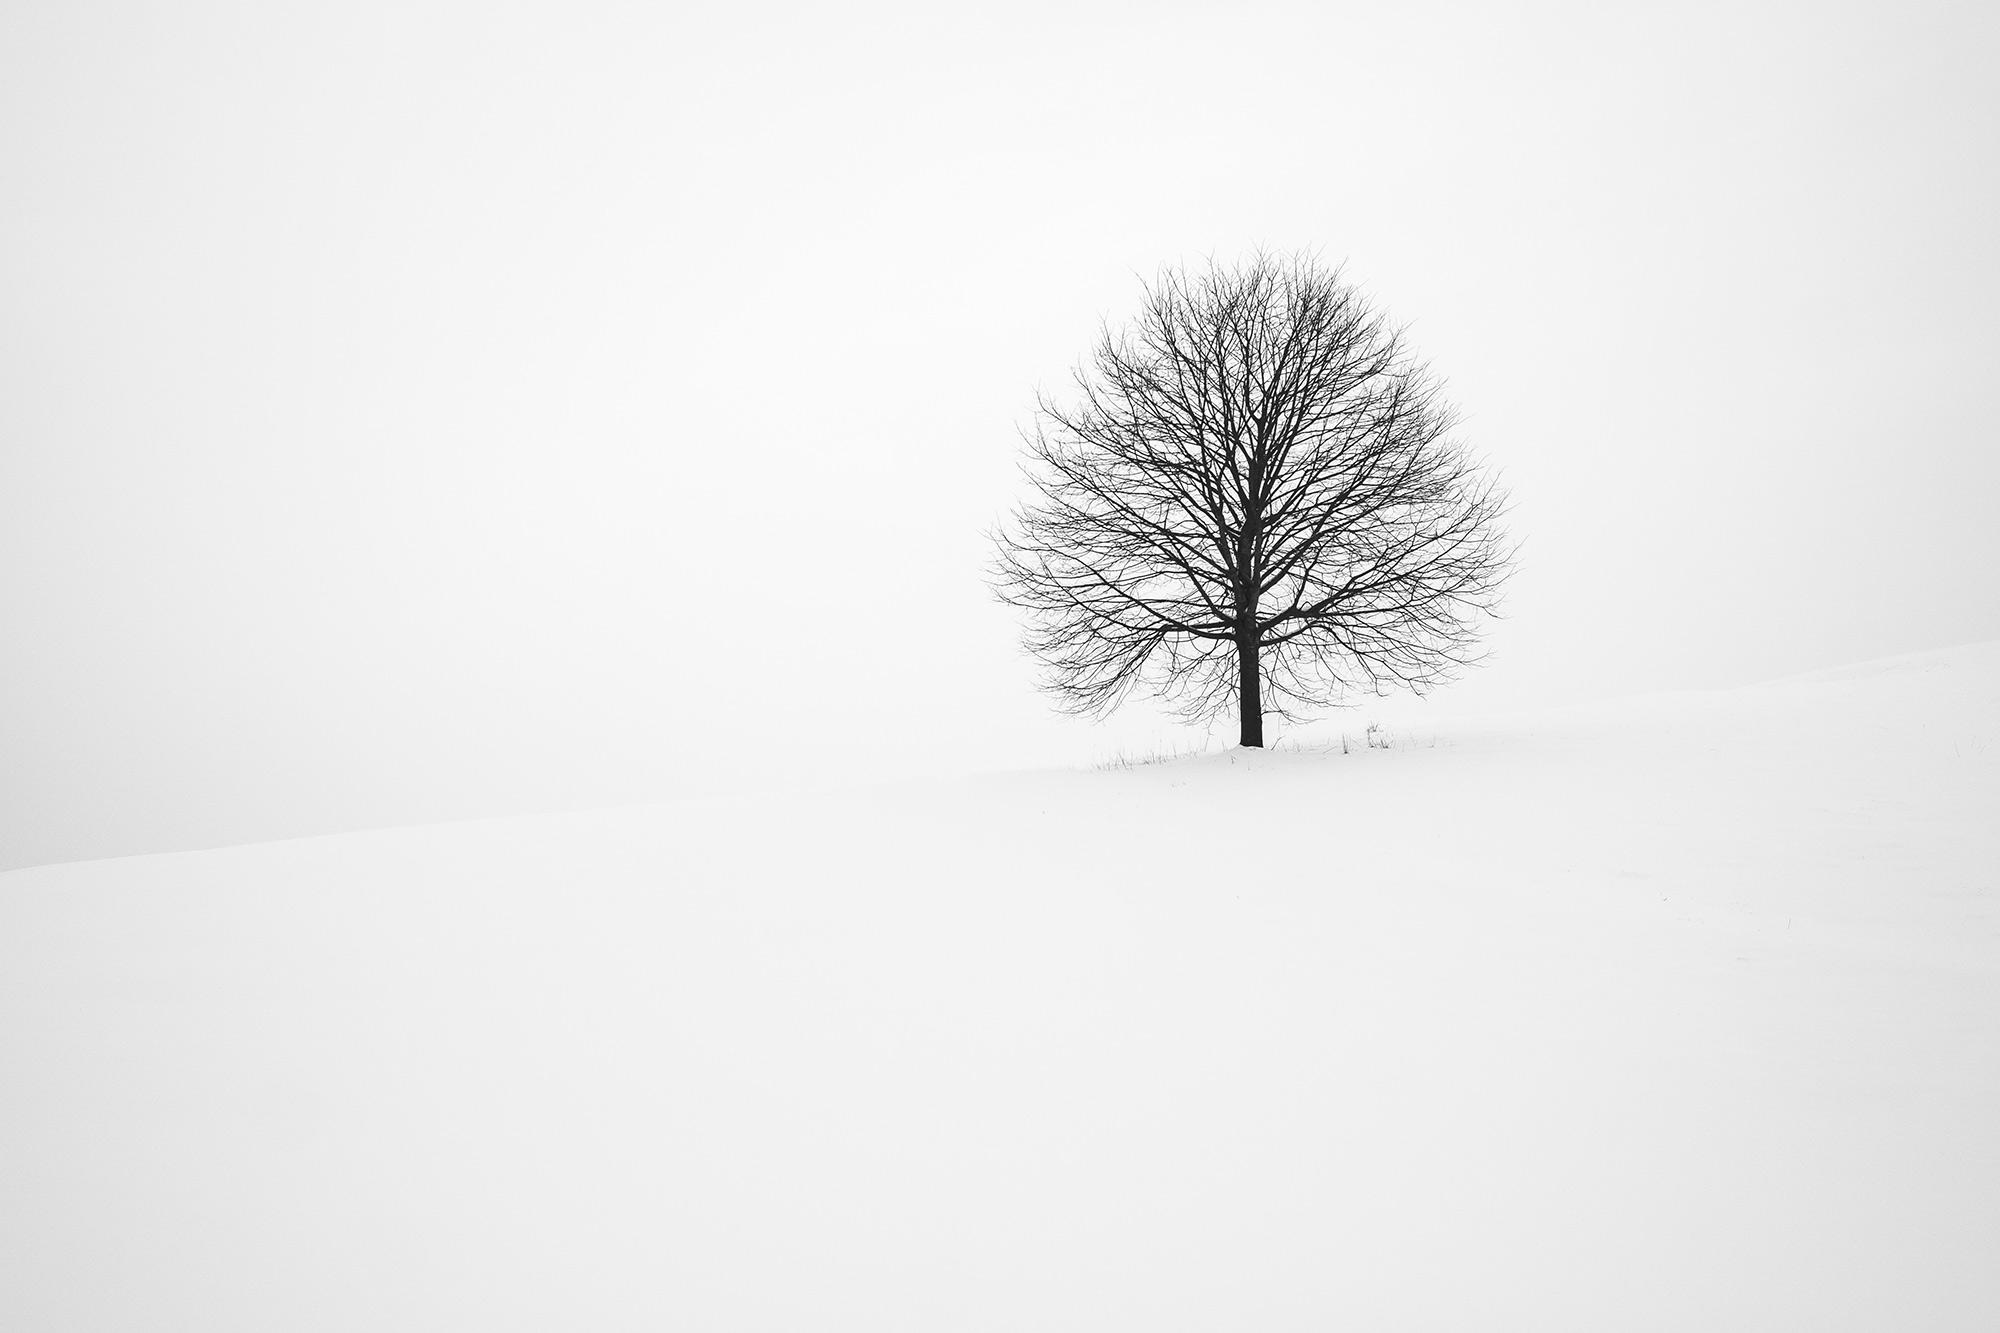 2 minimal-tree-in-snow-unsplash-photo.jpg